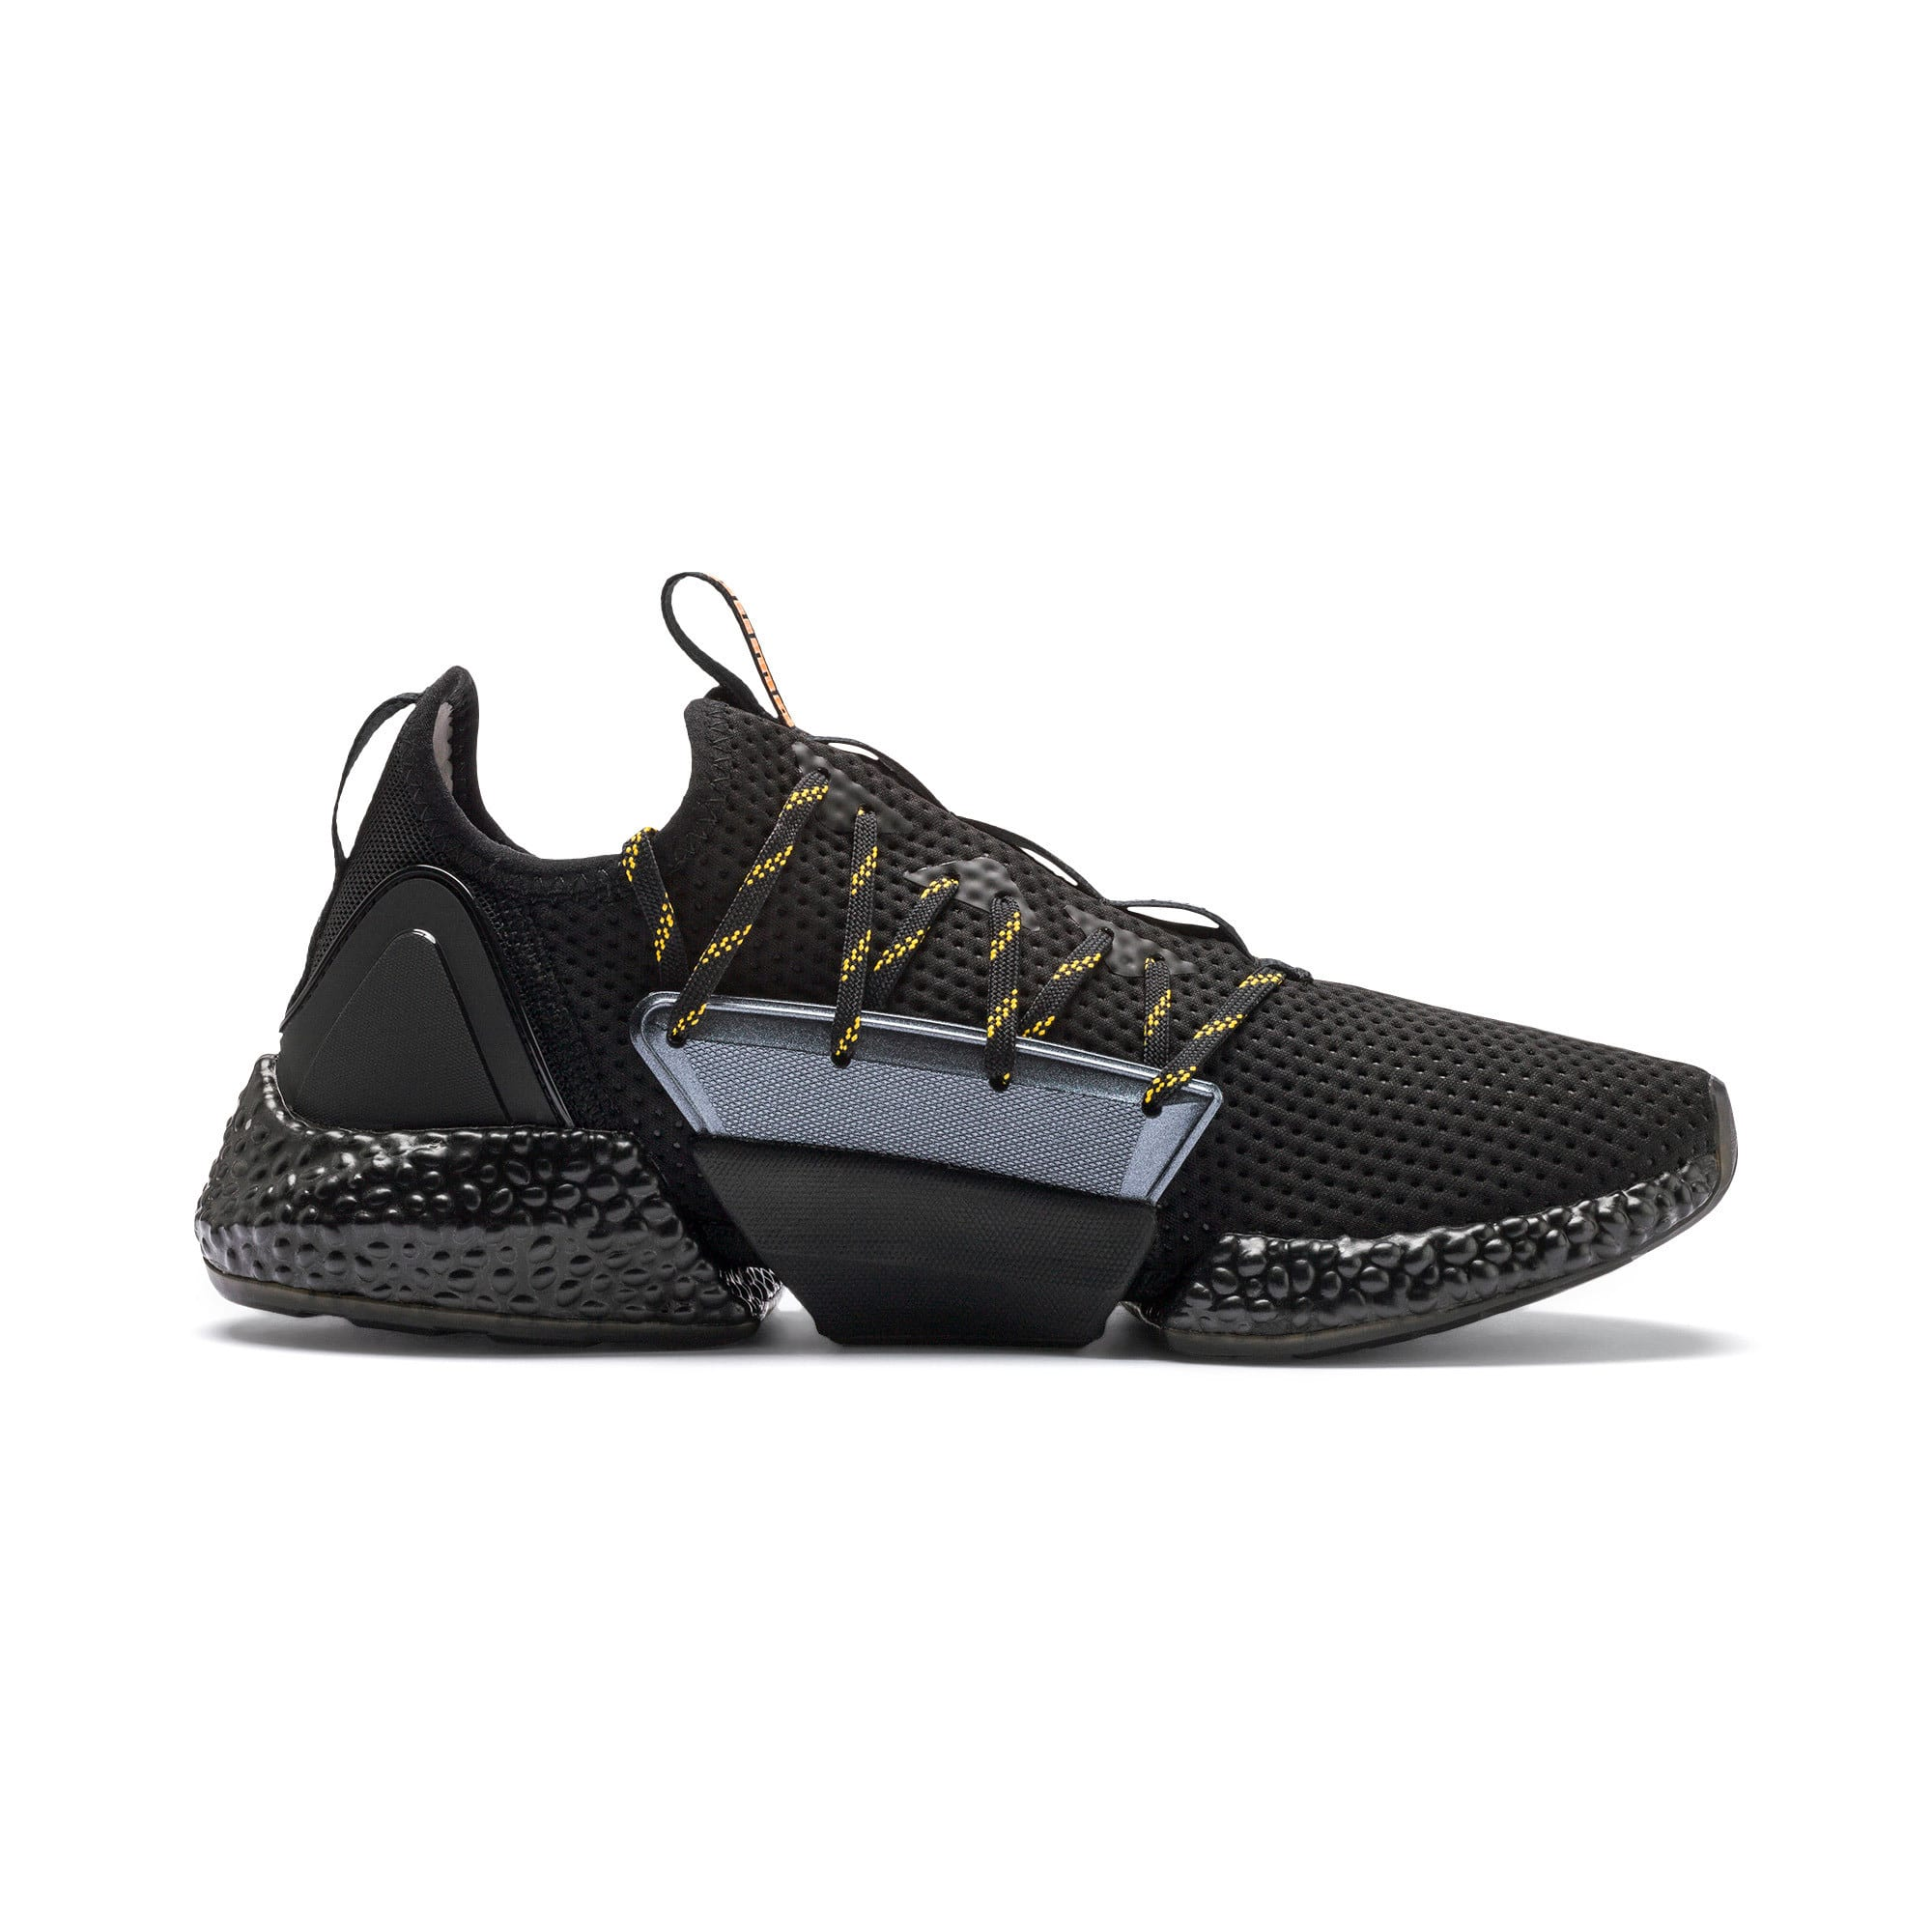 Thumbnail 6 of HYBRID Rocket Aero Men's Sneakers, Puma Black-Puma Black, medium